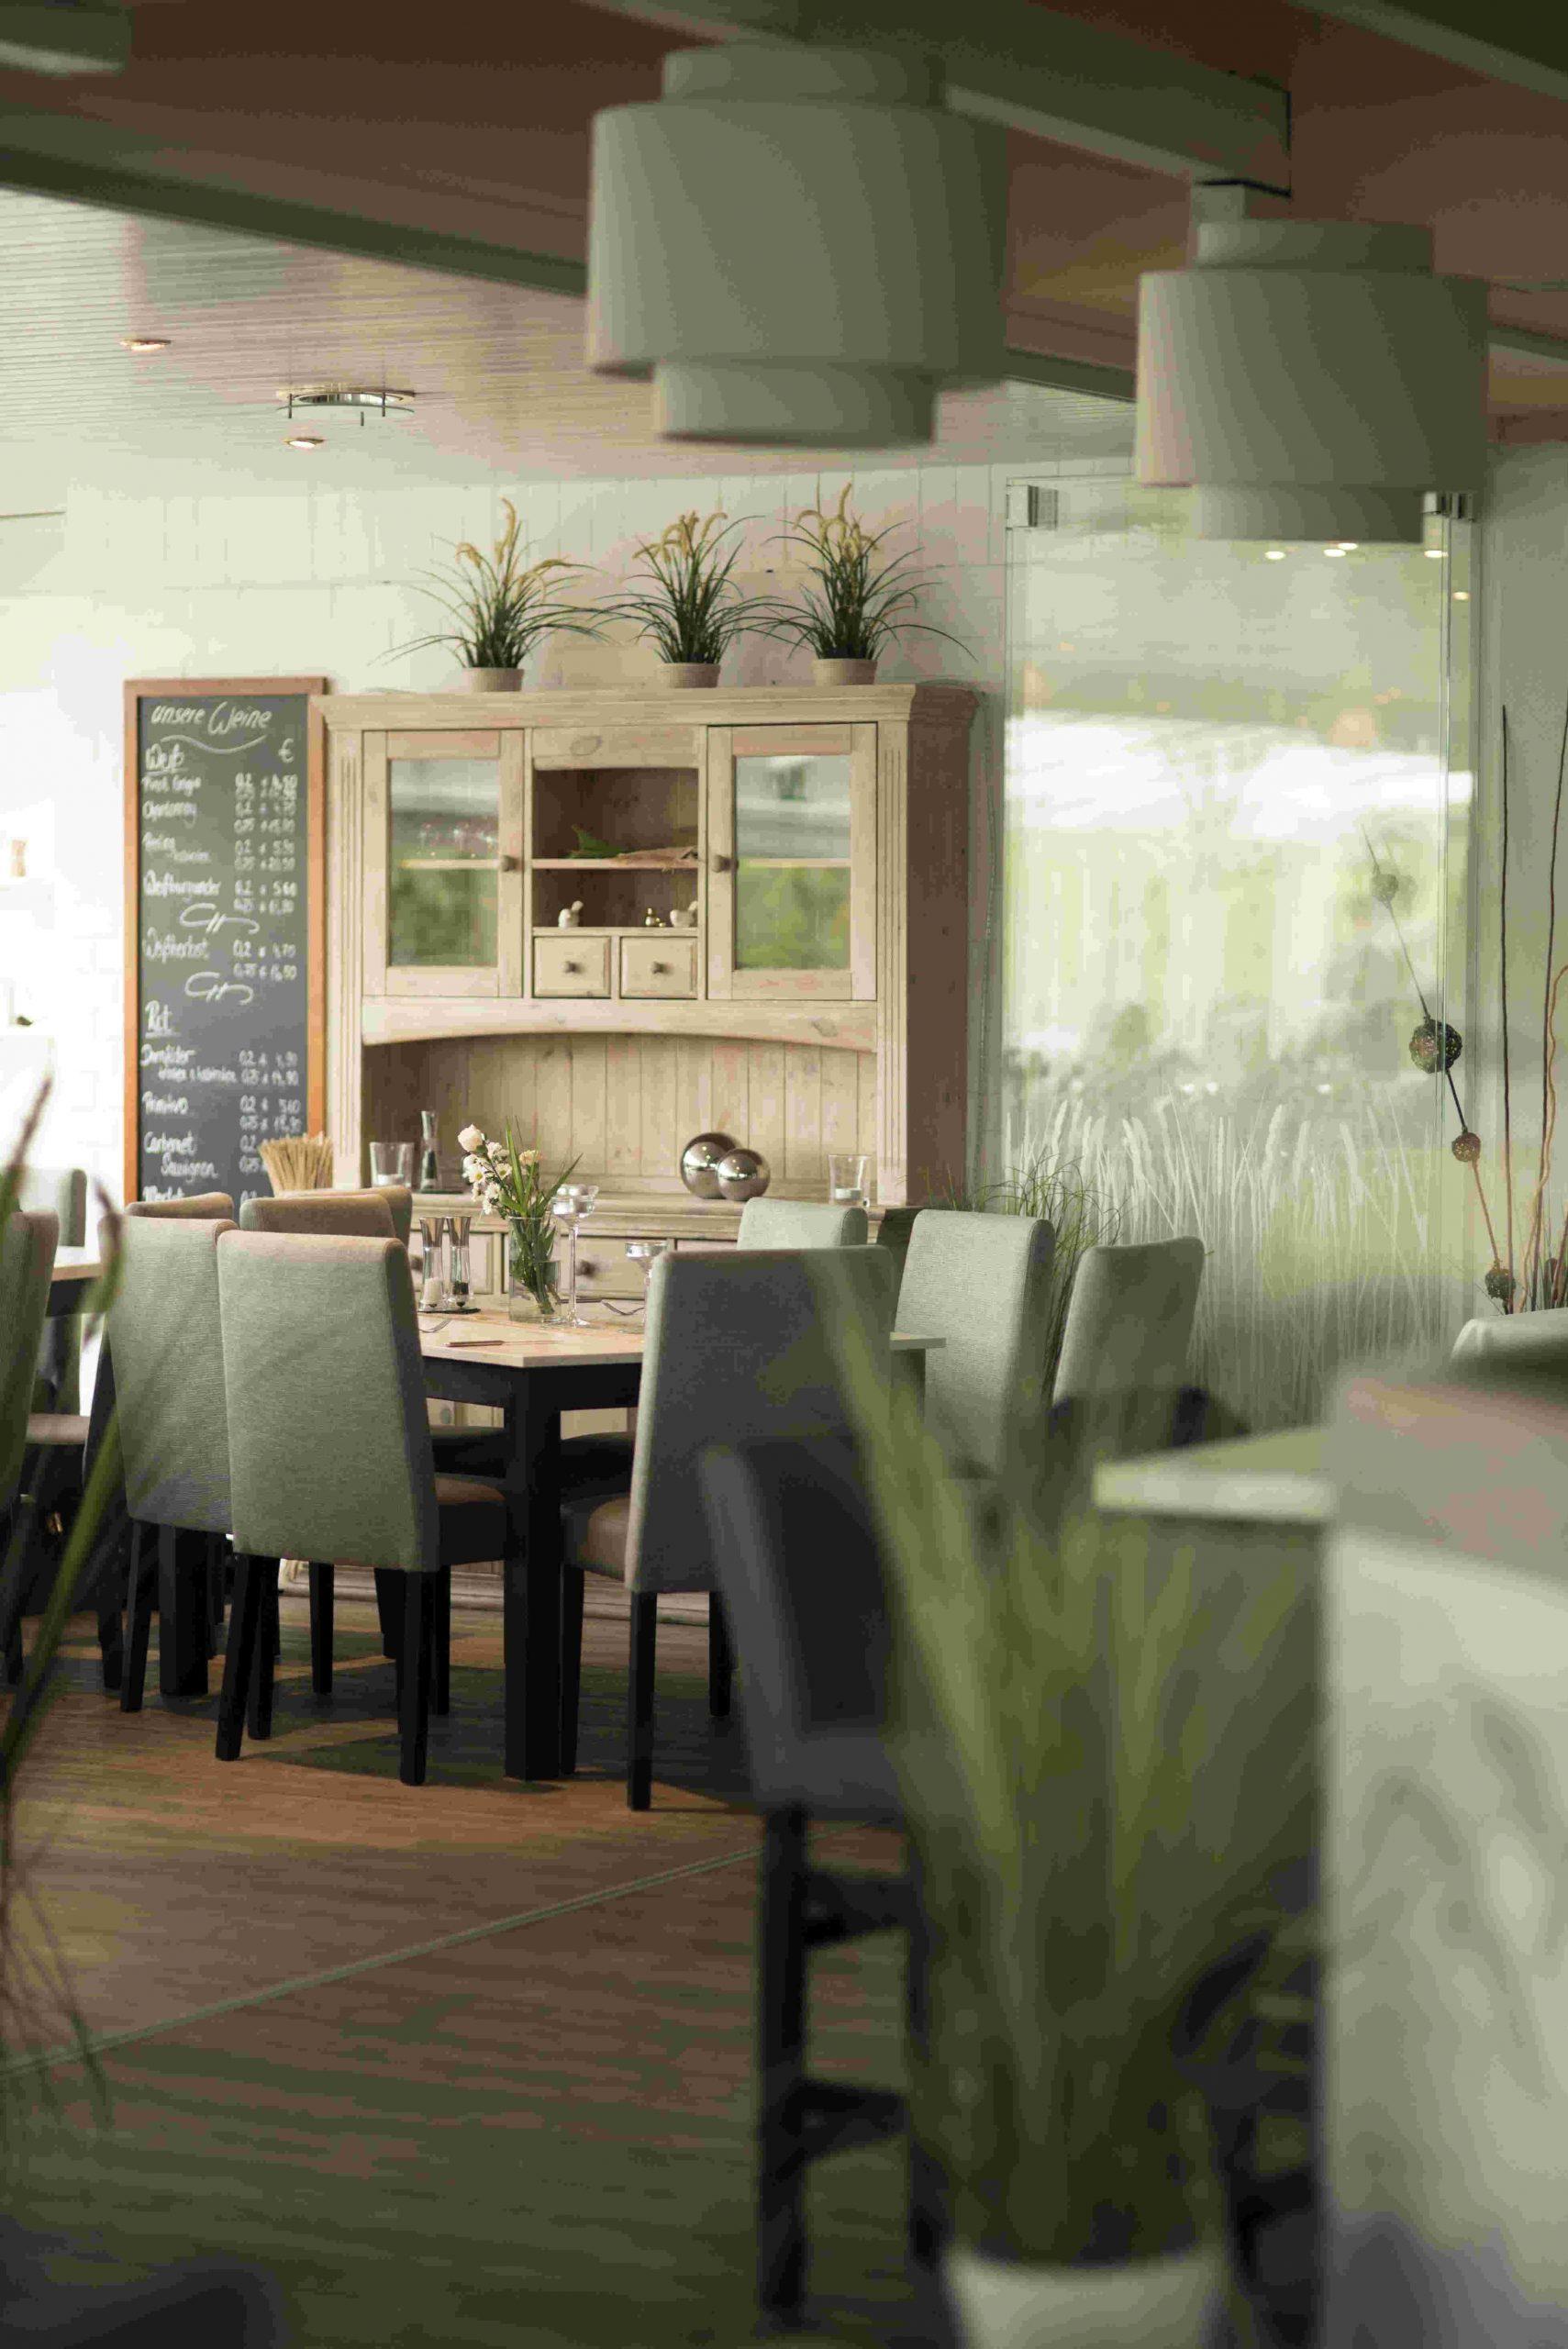 Restaurant | © Campingplatz Stover Strand International Kloodt oHG